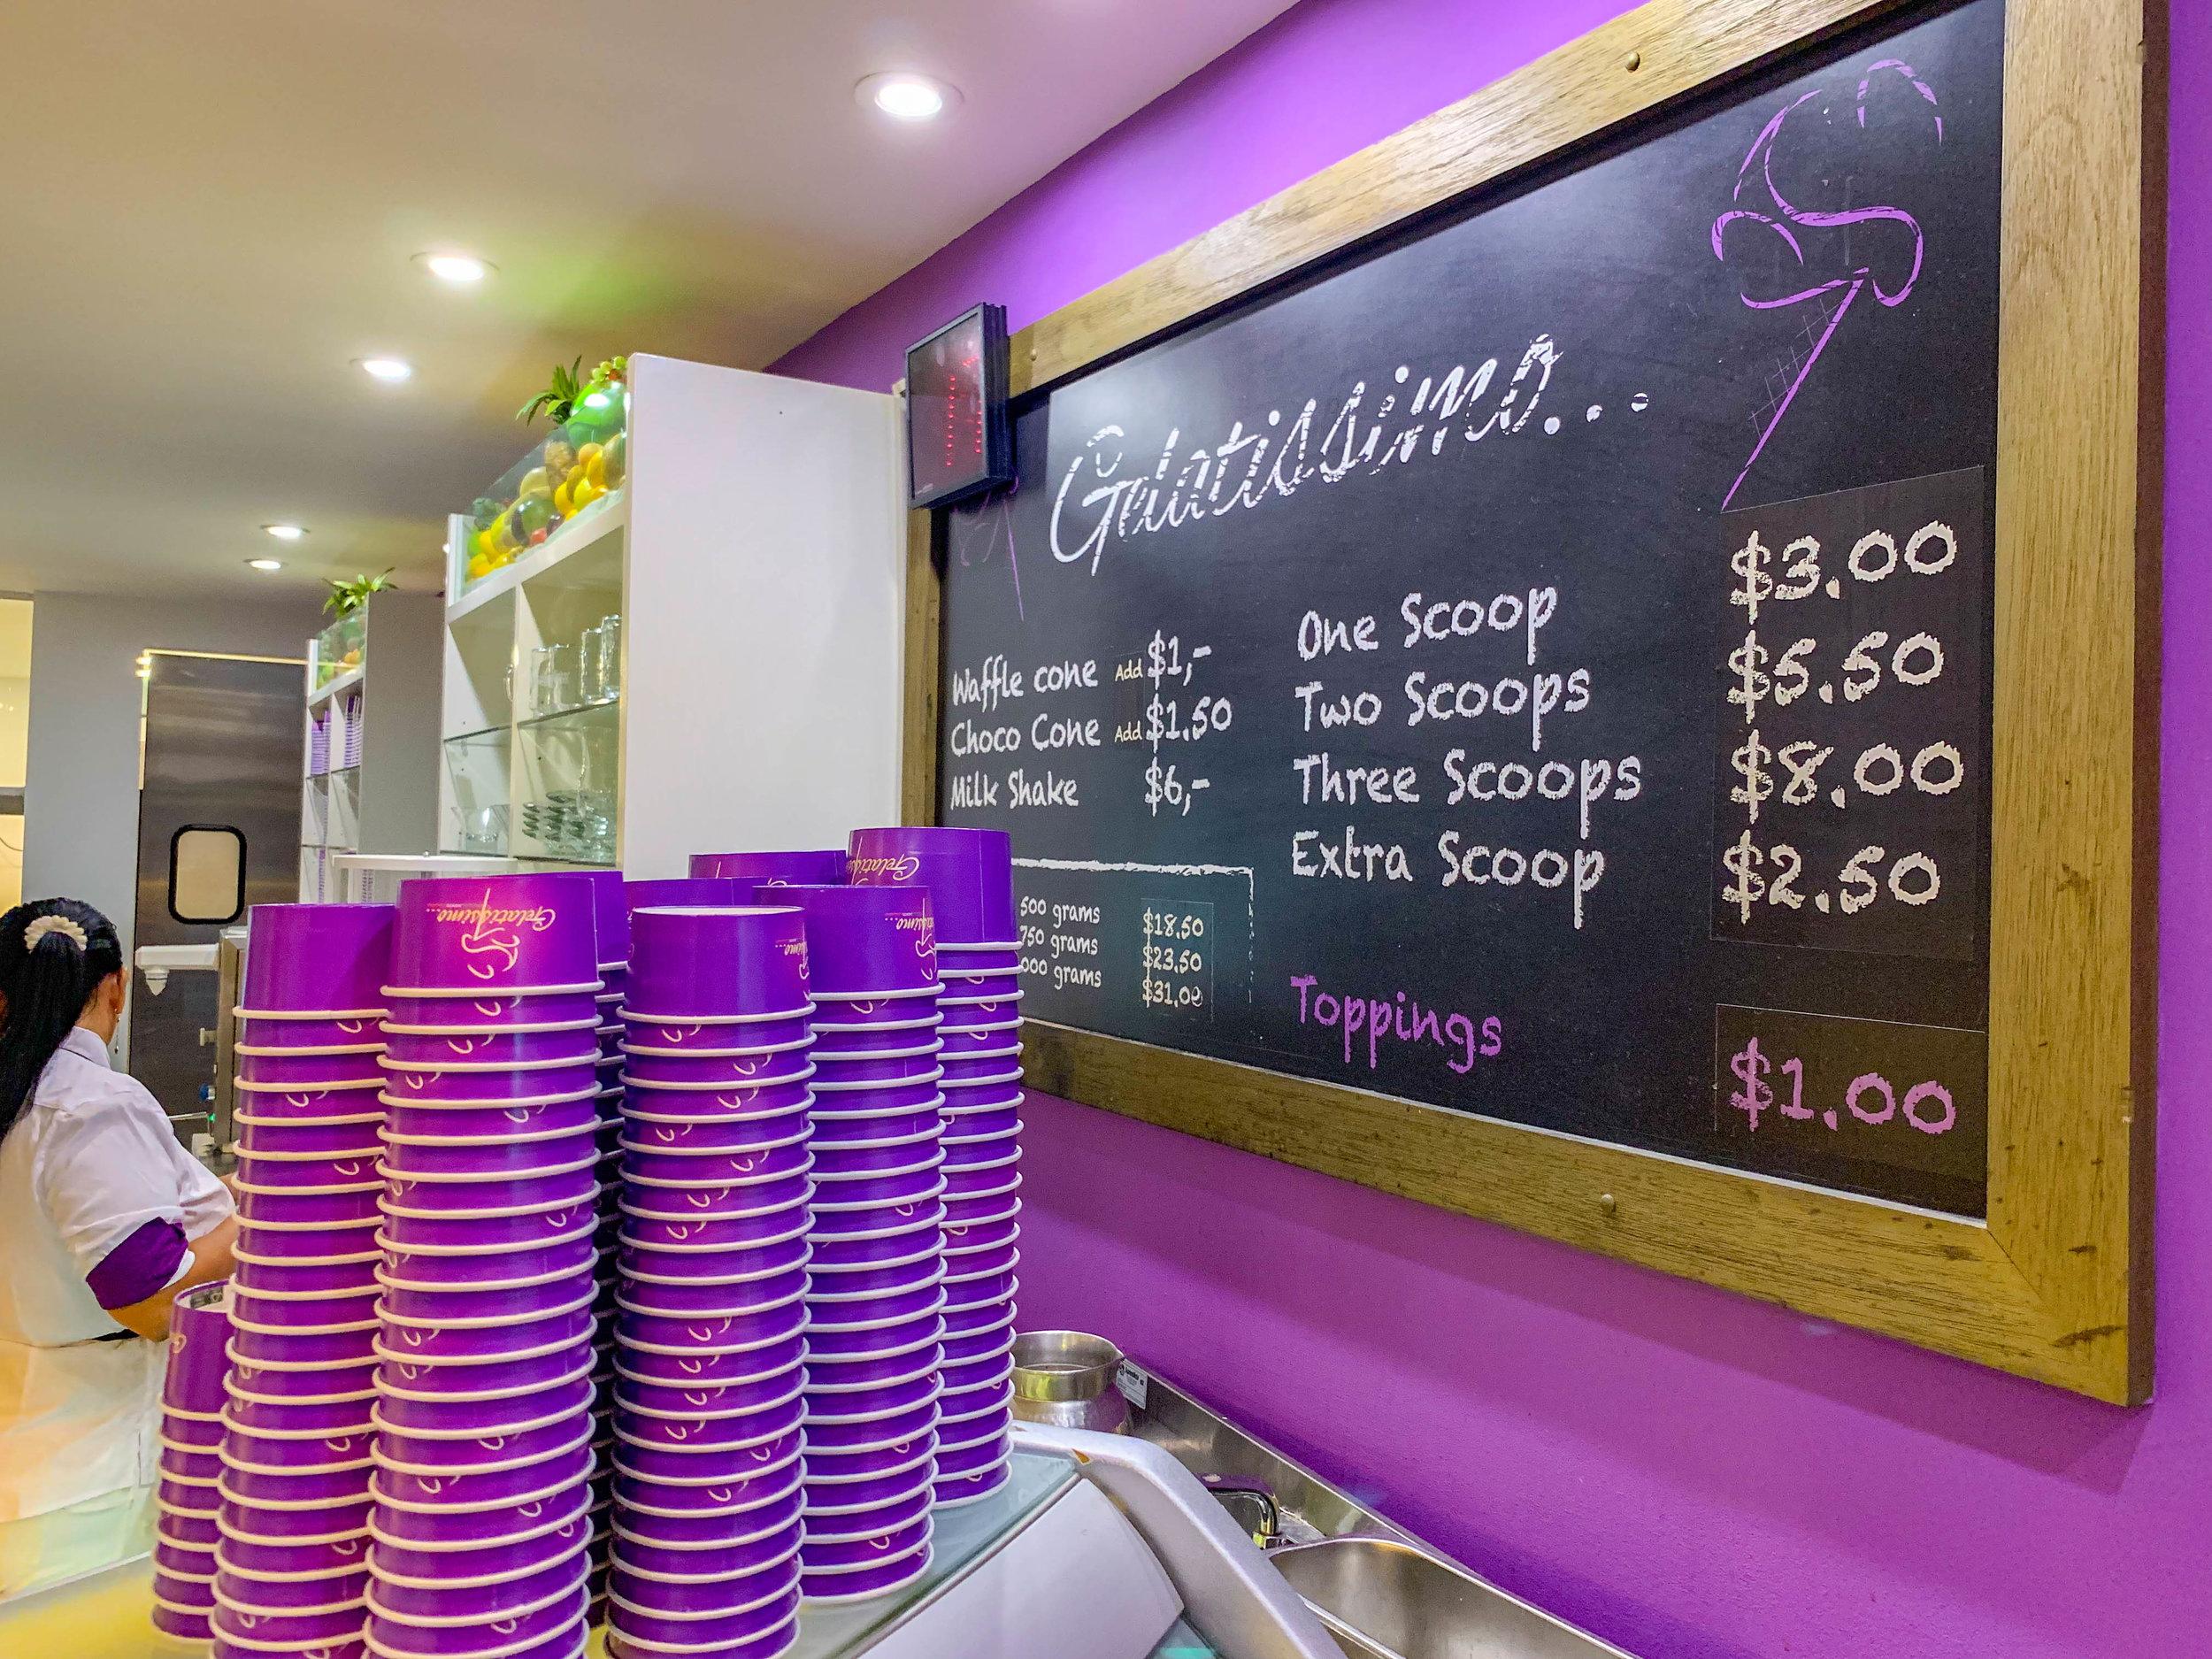 Gelatissimo Aruba Ice Cream